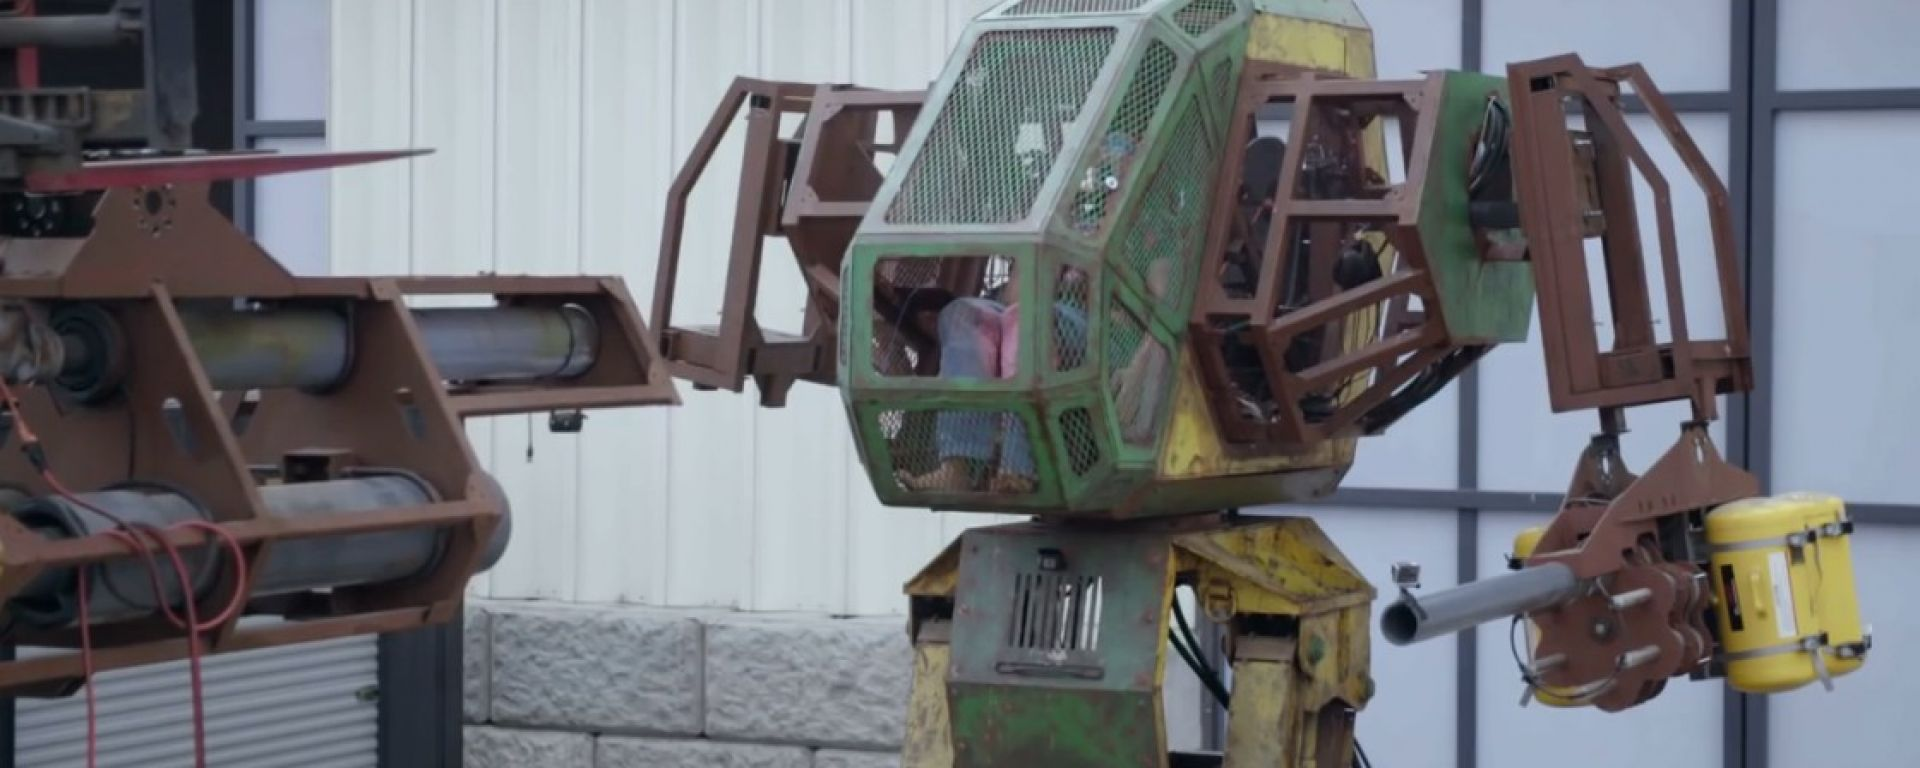 MegaBots Mk.II: test di resistenza